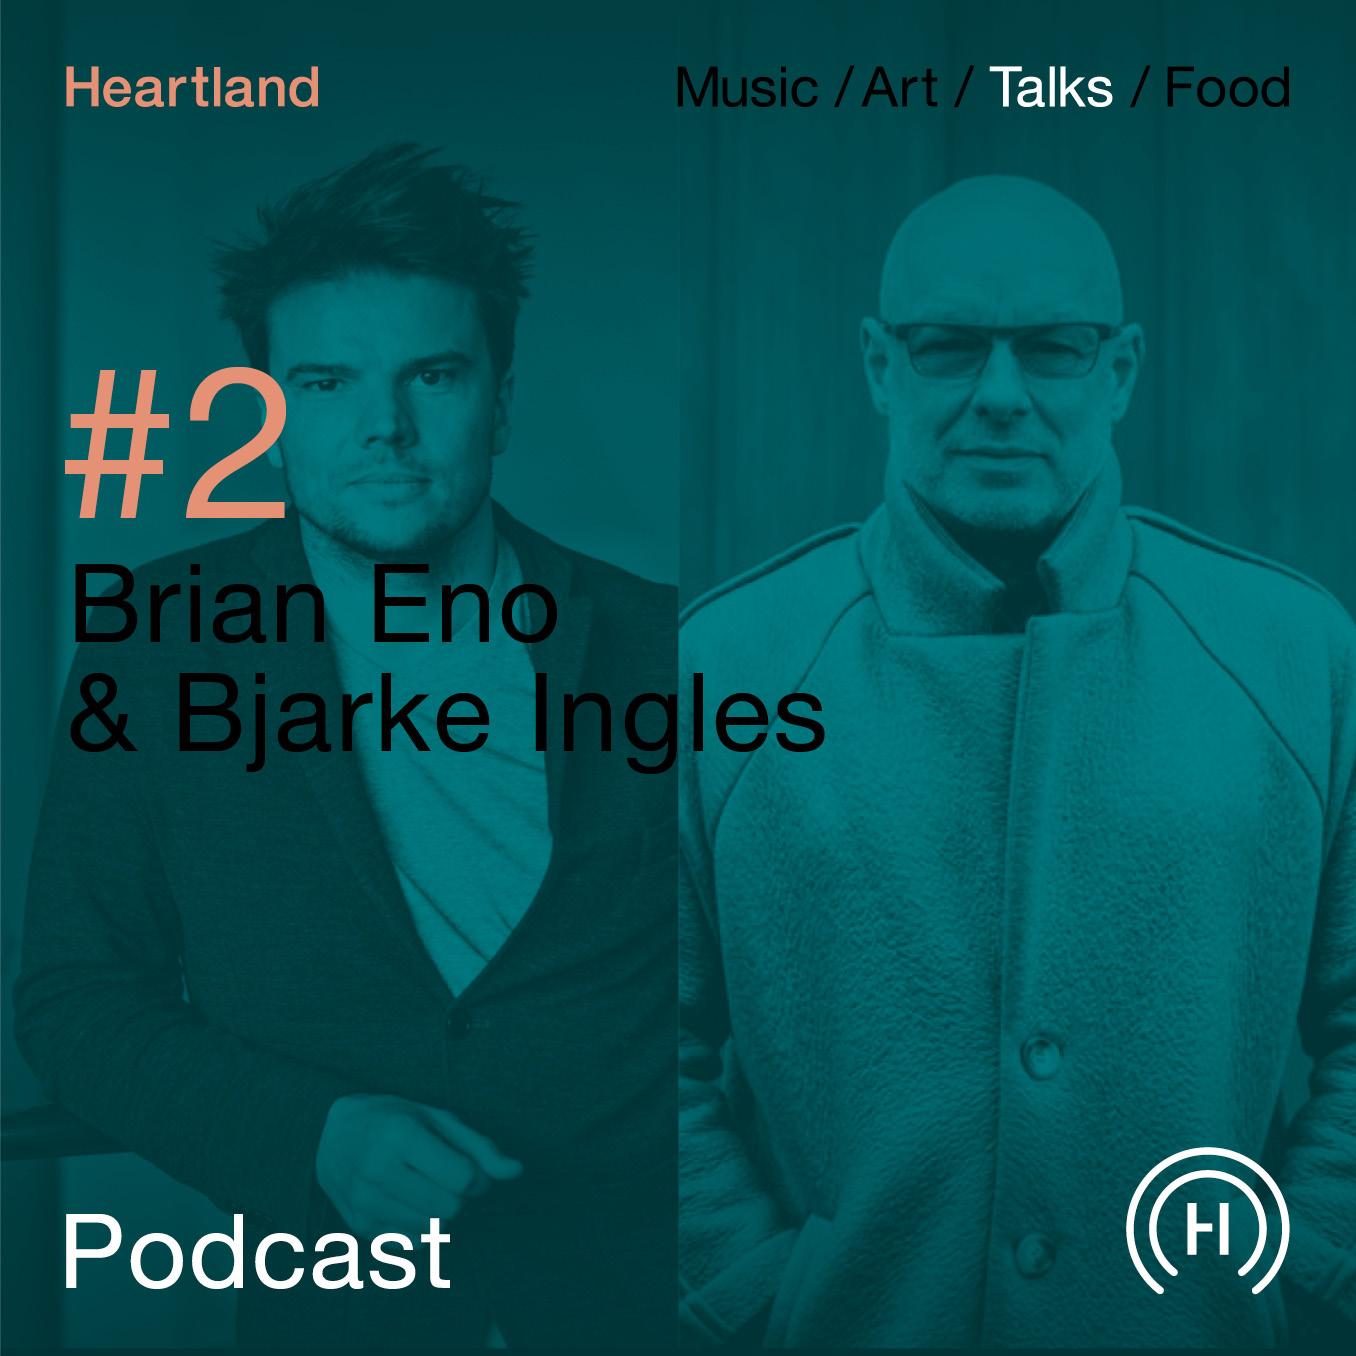 Heartland_New2018_Podcast#2.jpg